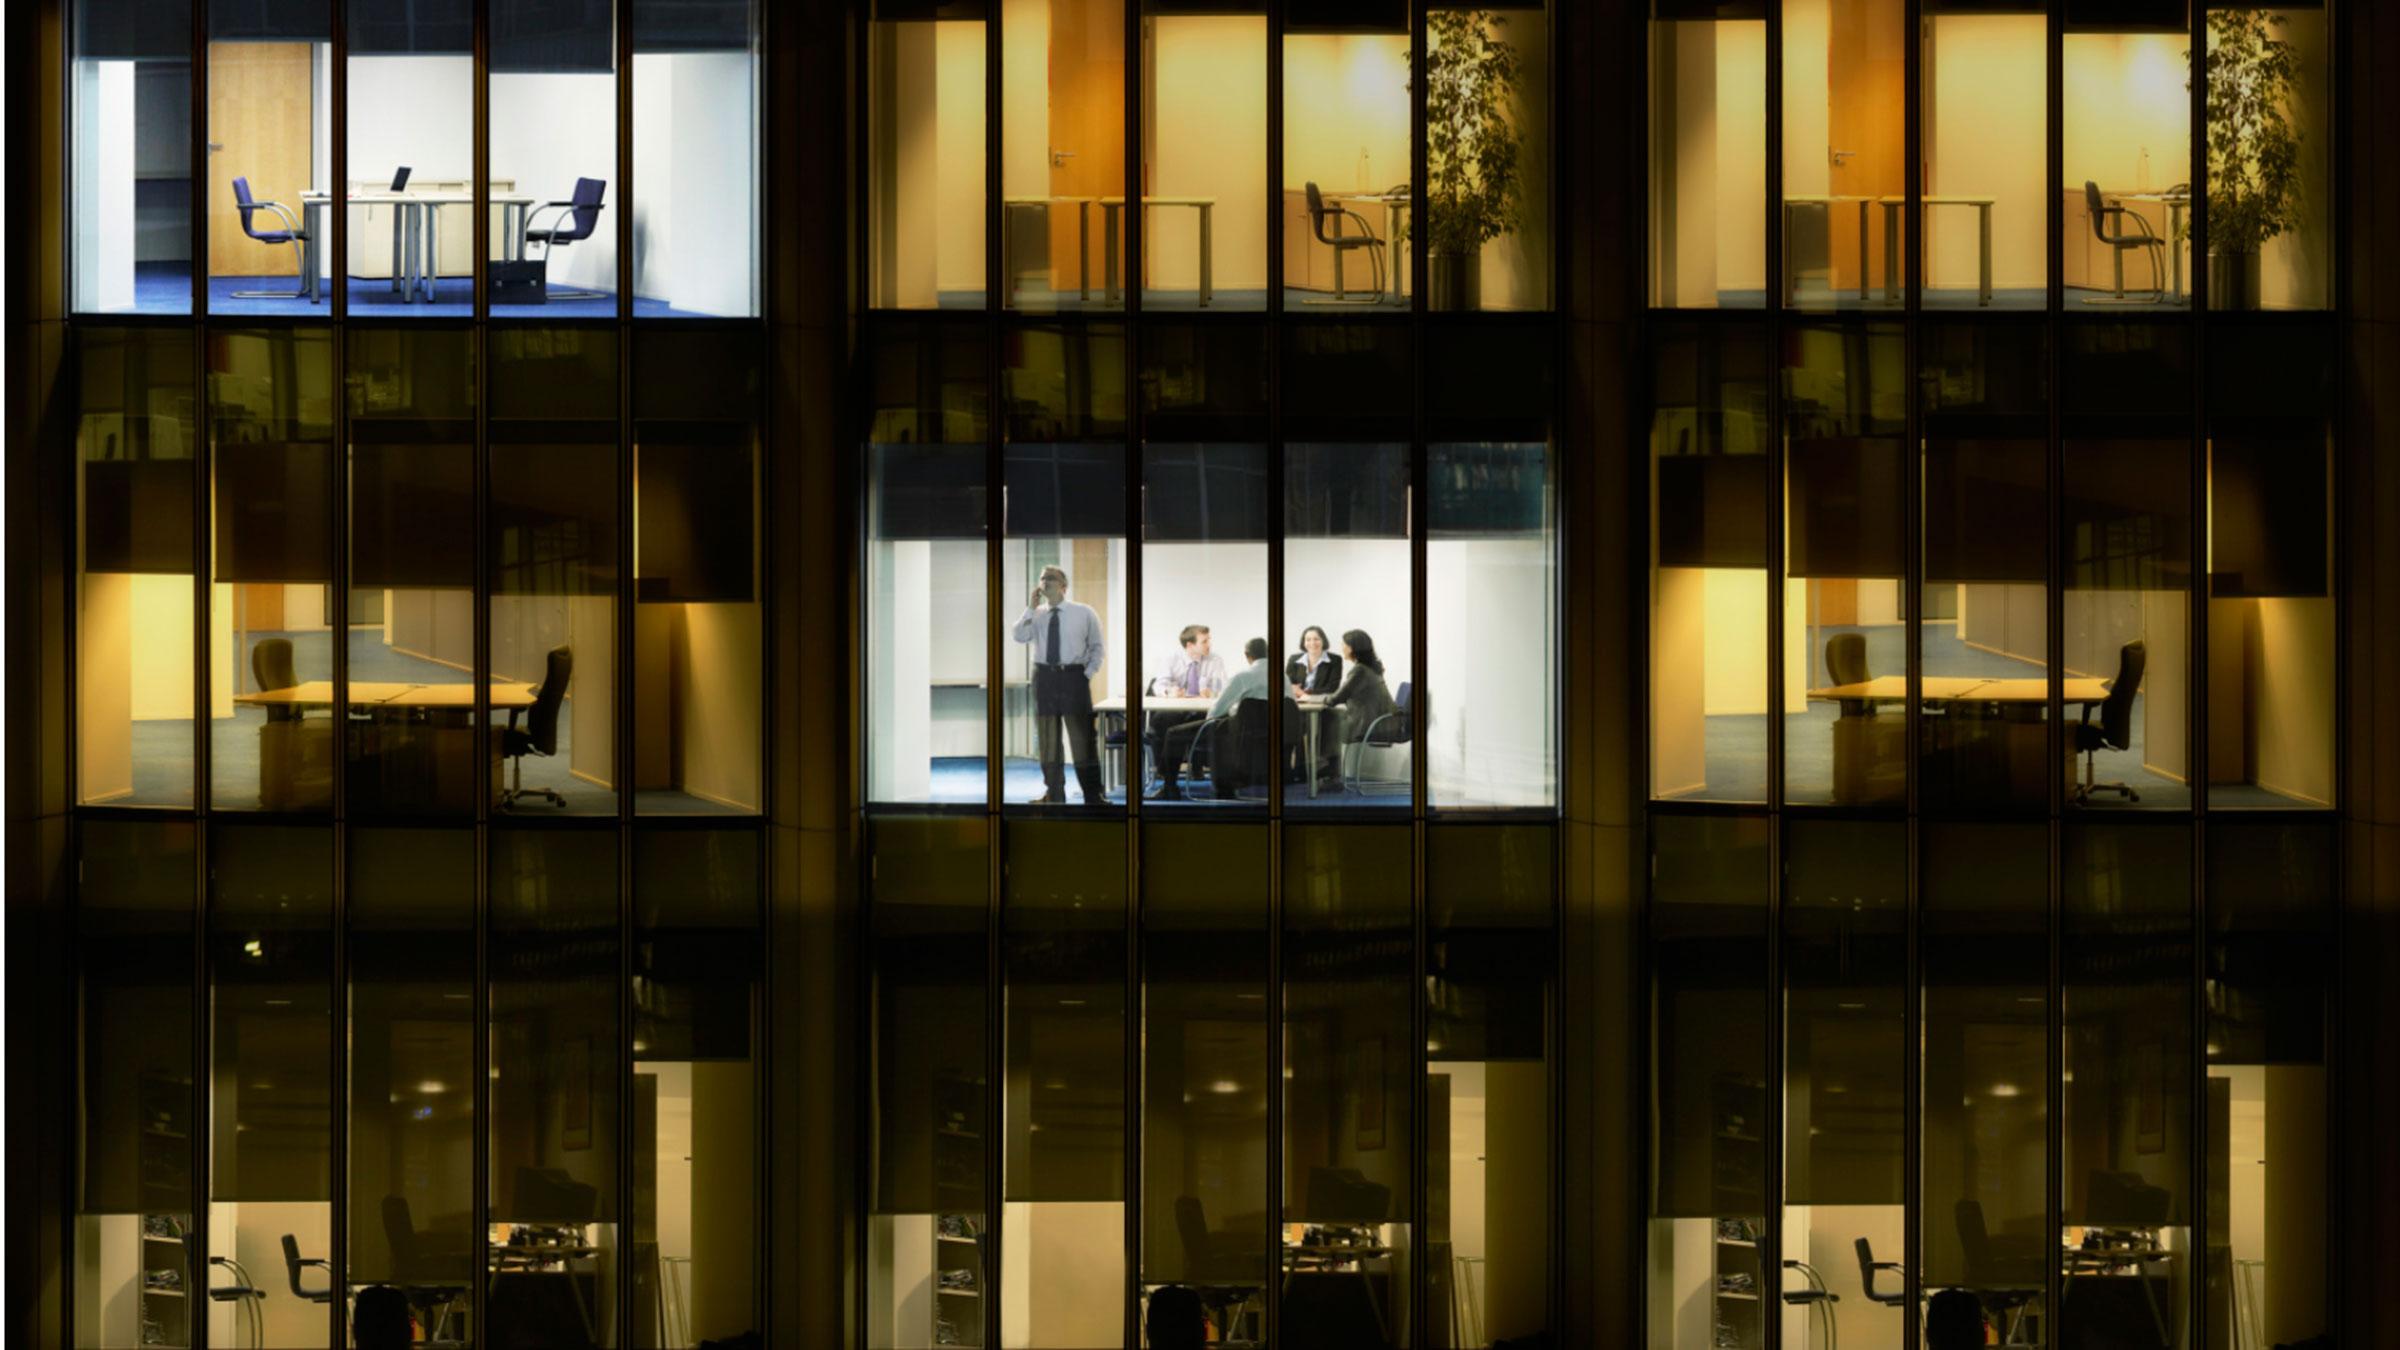 Office Building Lights 11152012